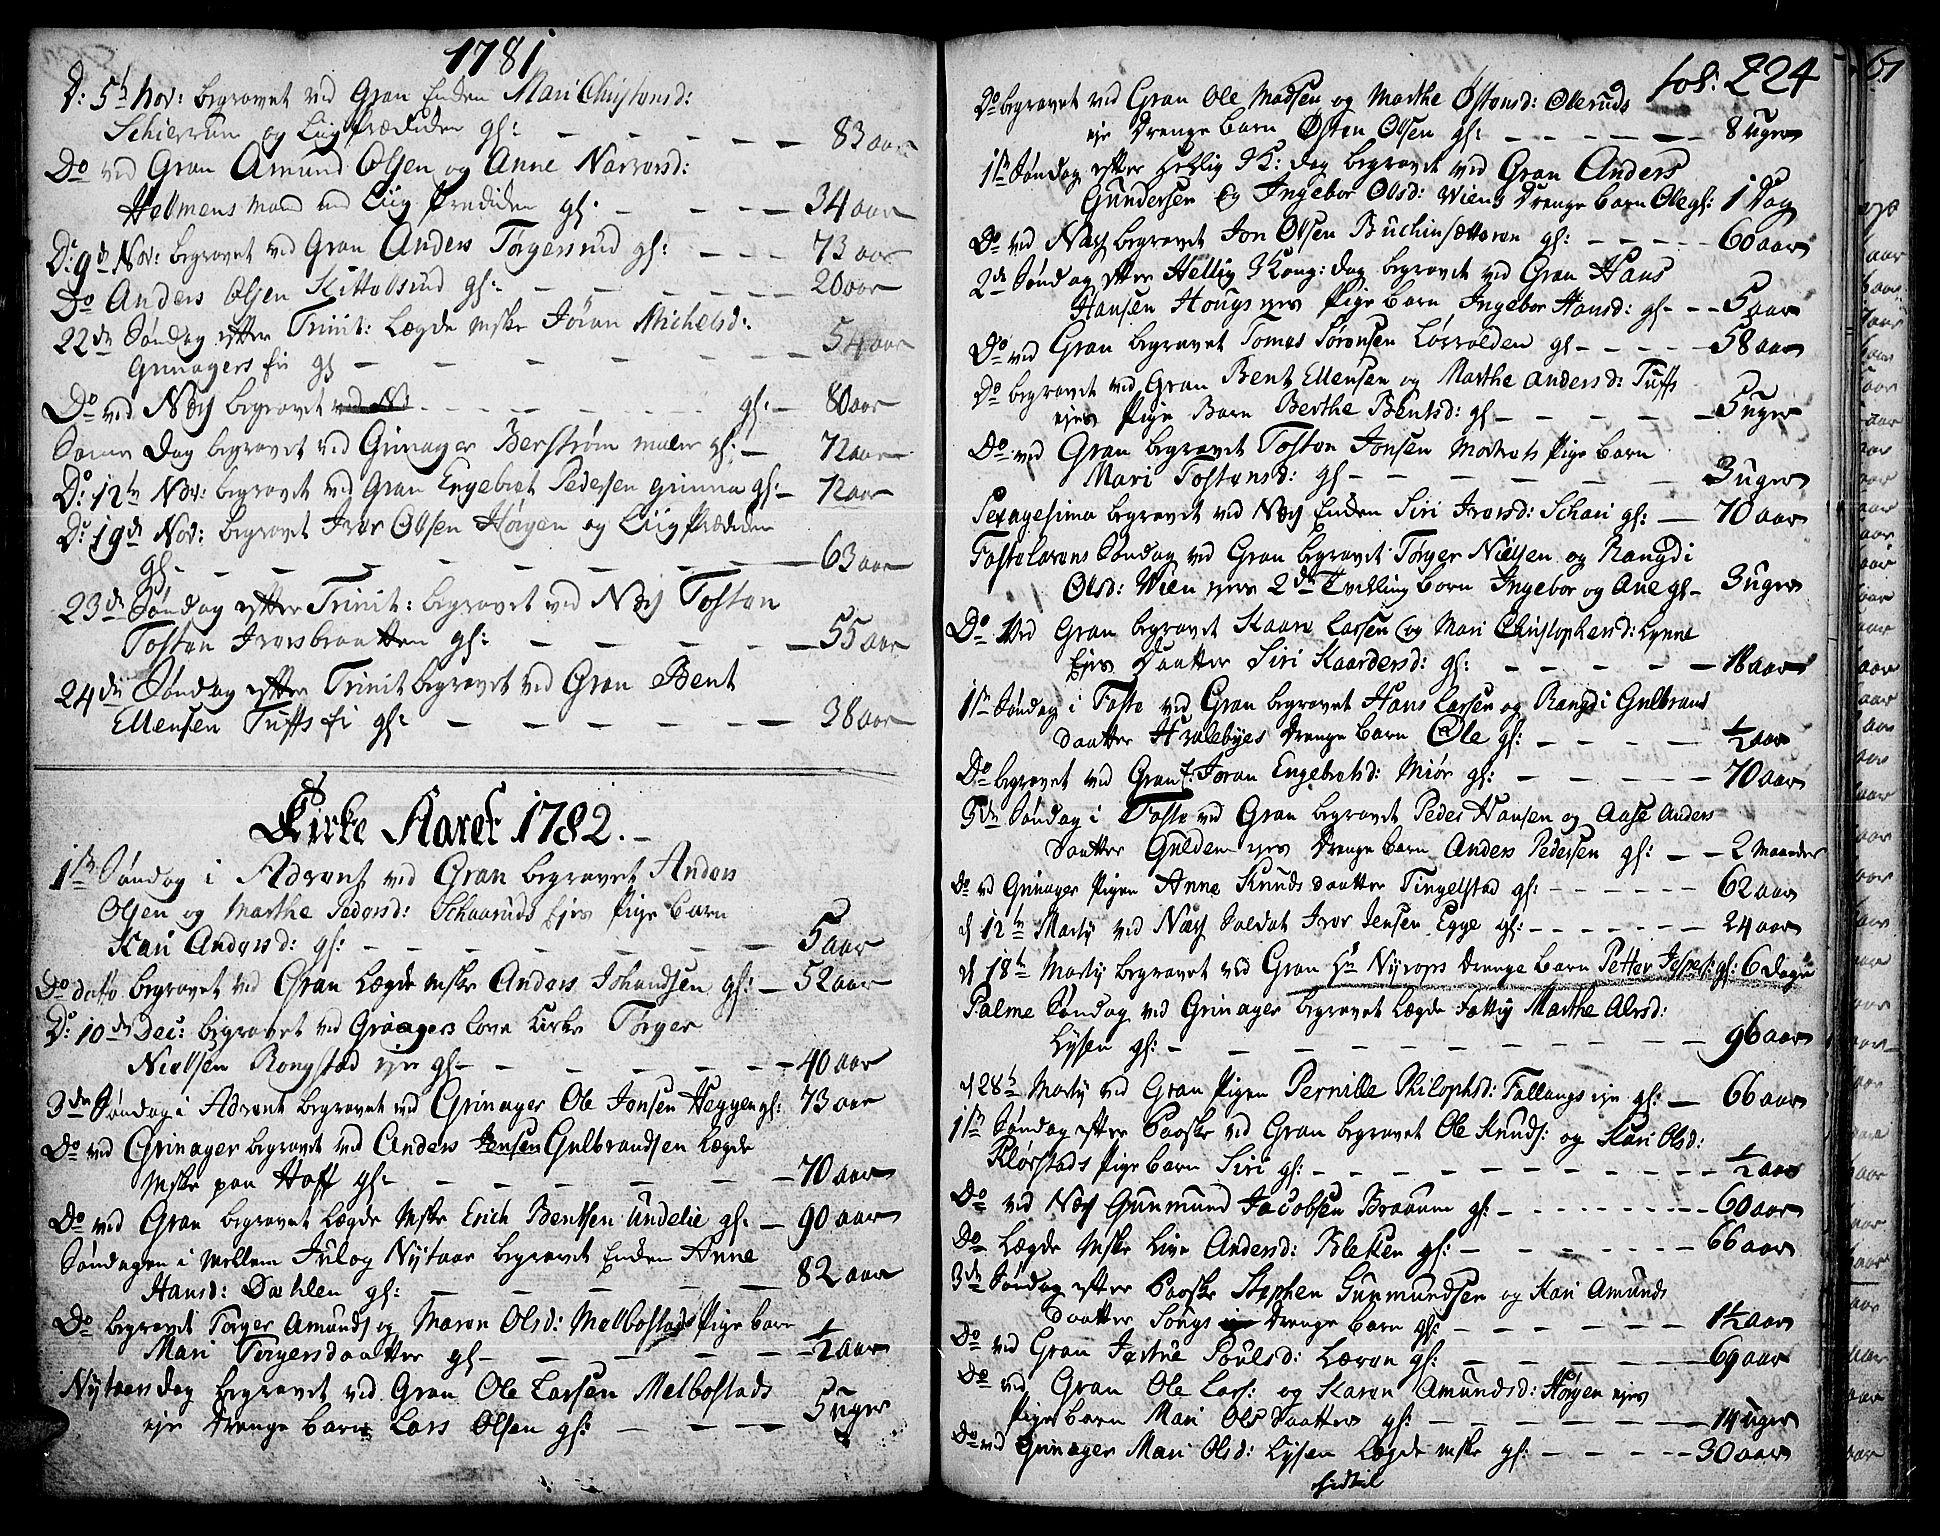 SAH, Gran prestekontor, Ministerialbok nr. 5, 1776-1788, s. 224